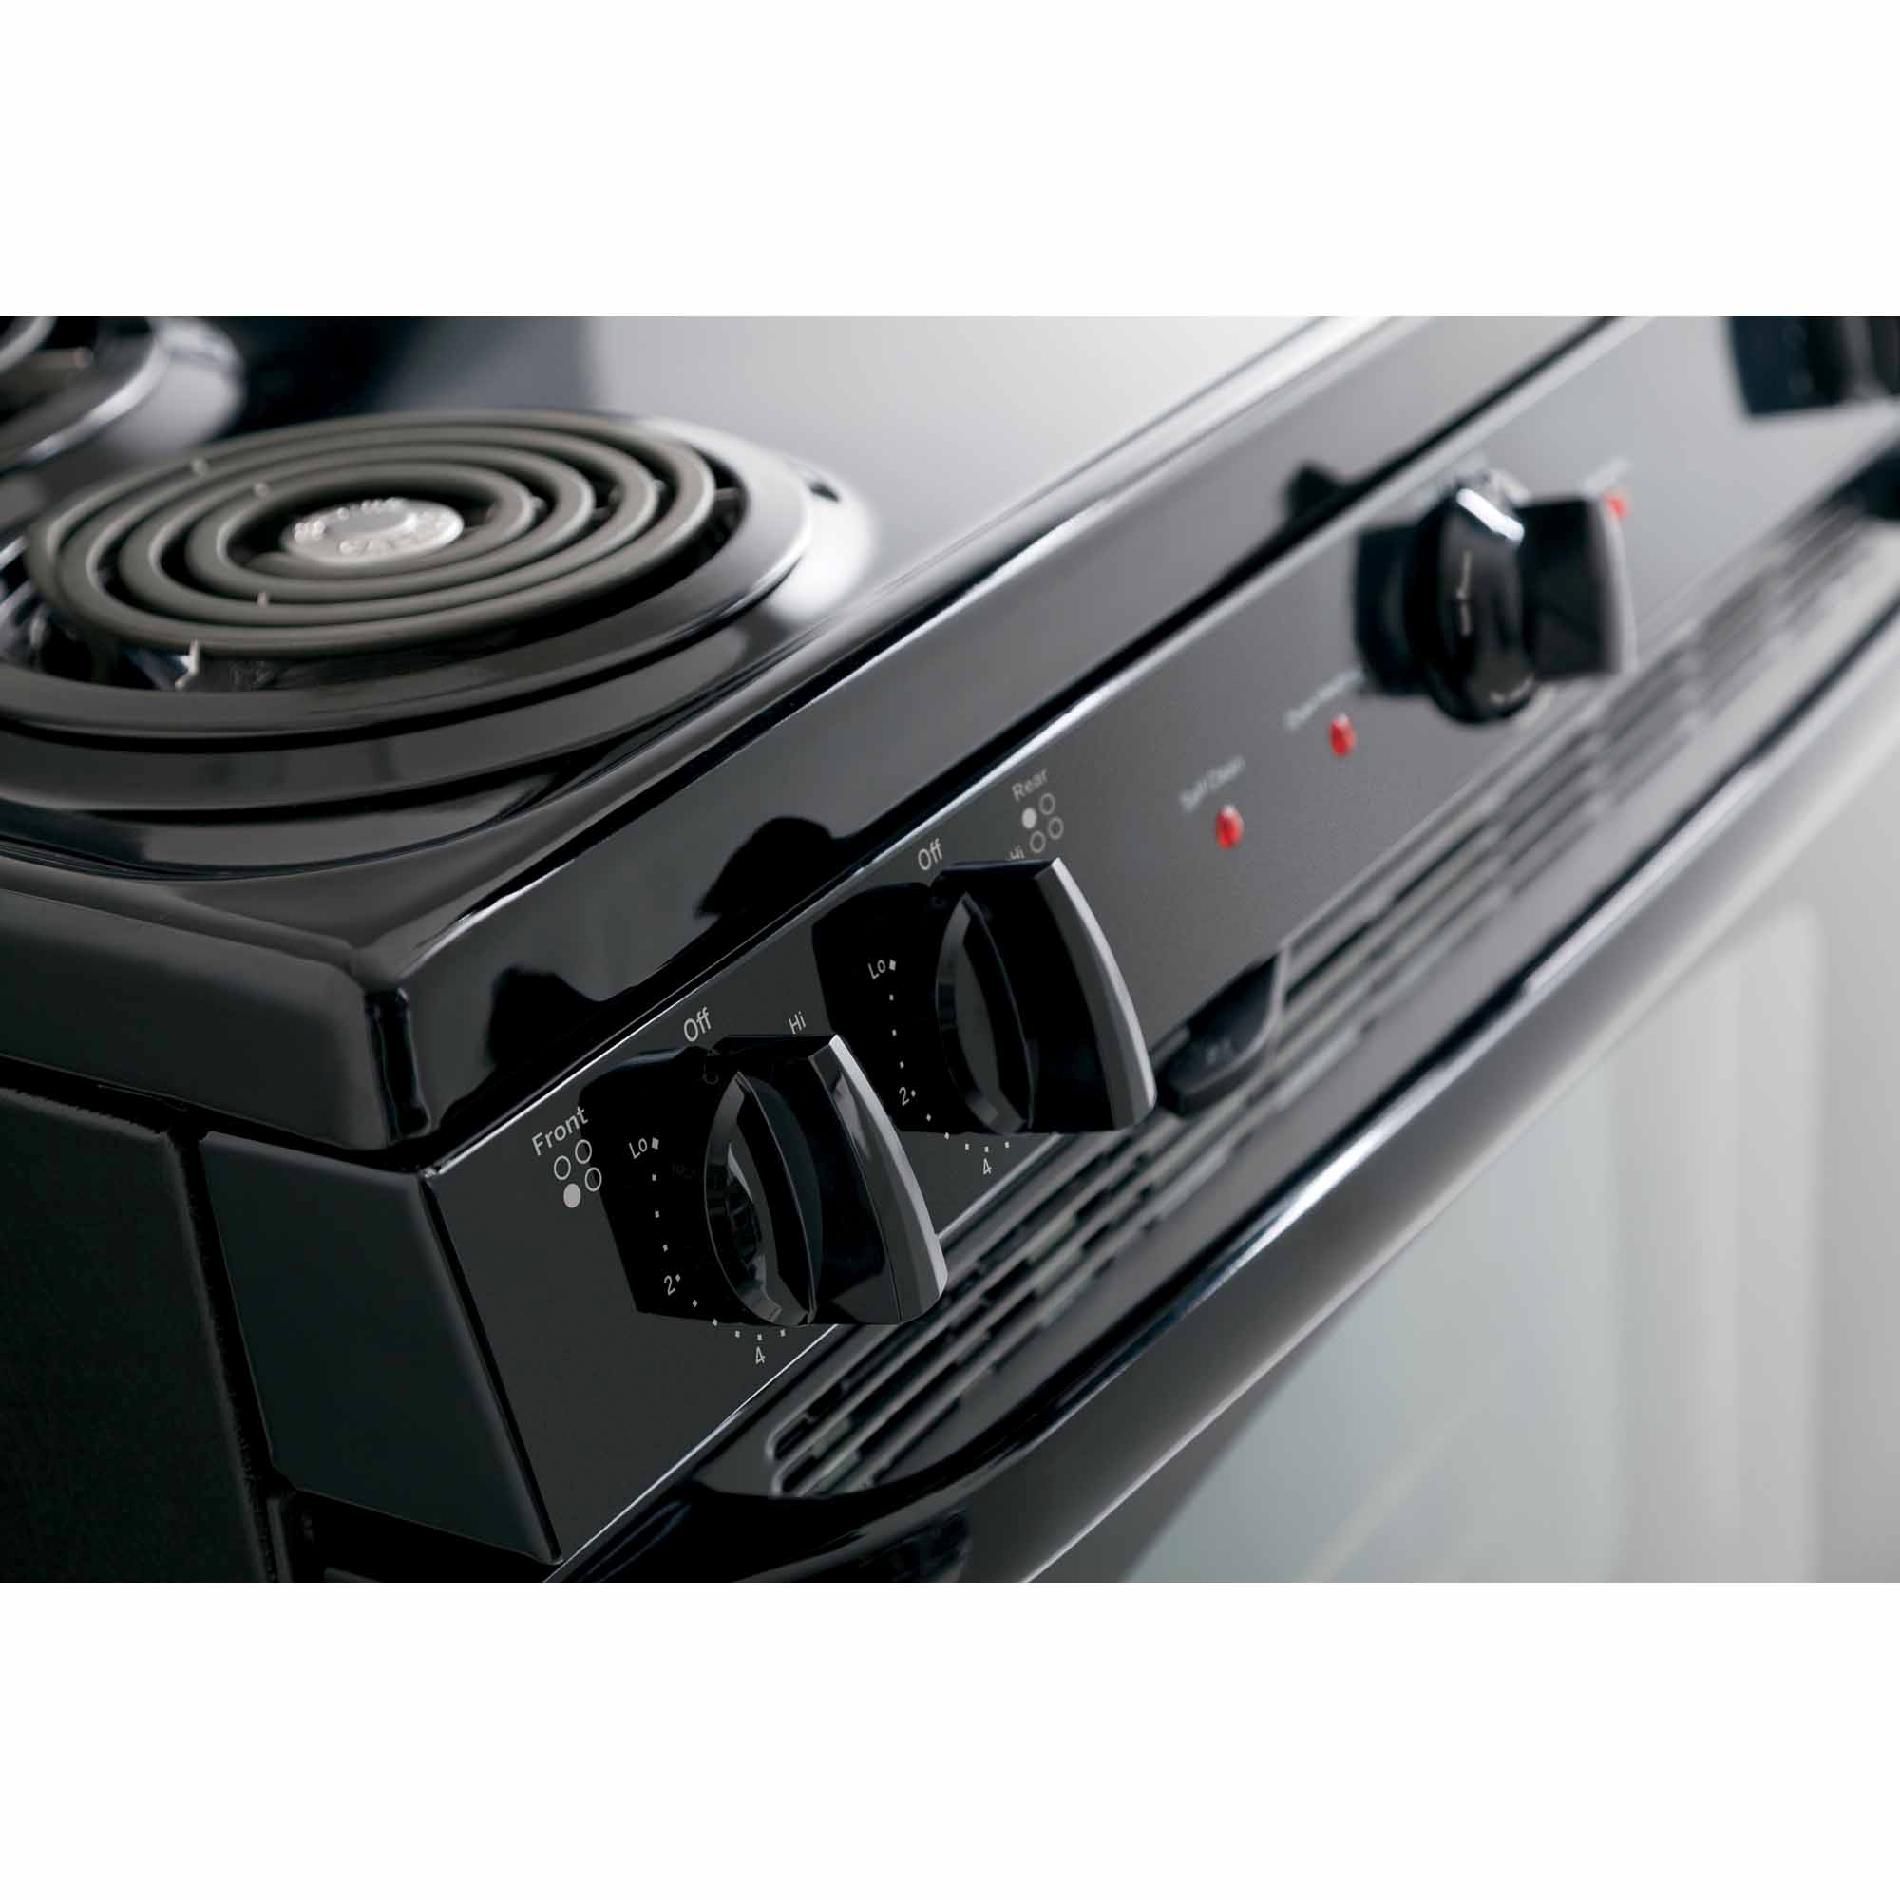 GE Appliances JB450DFBB 5.0 cu. ft. Electric Range - Black